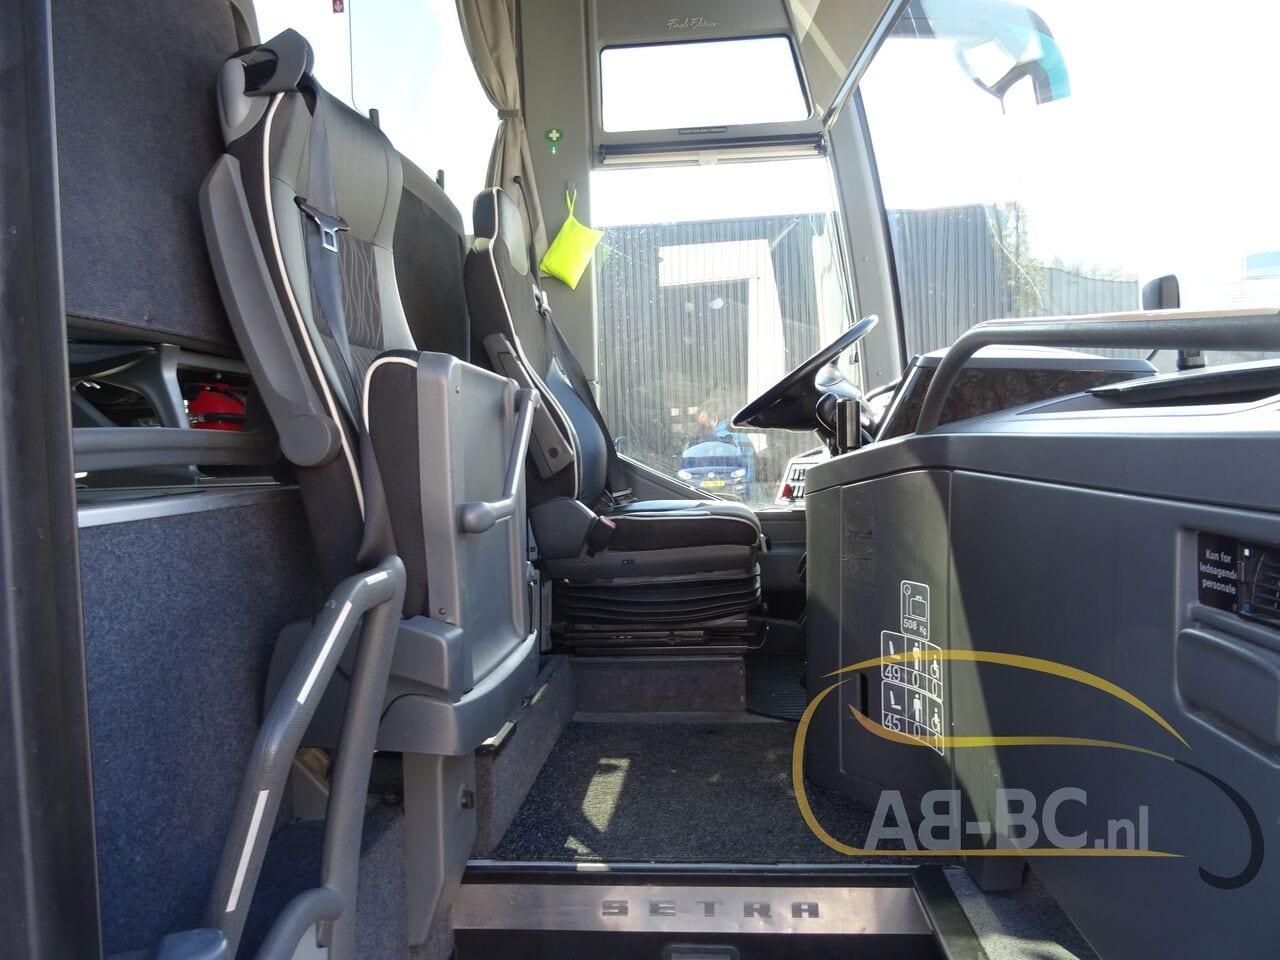 coach-busSETRA-S415-GT-HD-FINAL-EDITION-51-SEATS-LIFTBUS---1620381905078534925_big_045652bbda859209c3b8265baa616c75--21050713010665719300